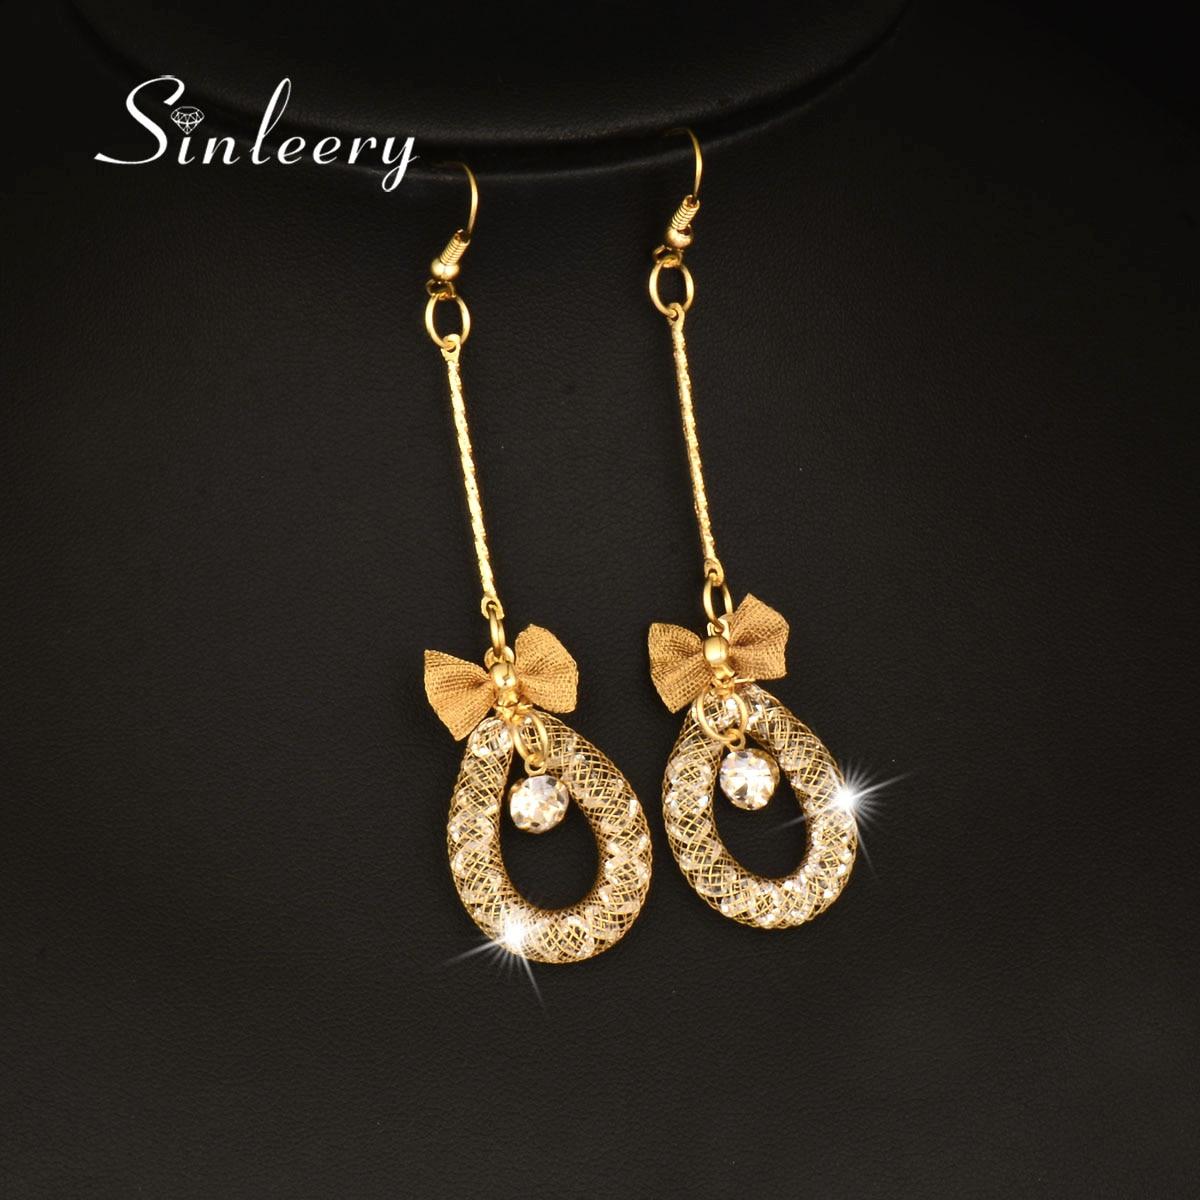 Sinleery Luxury Mesh Rhinestone Inside With Bow Drop Earrings Gold Color  Long Dangle Earring Fashion Jewelry